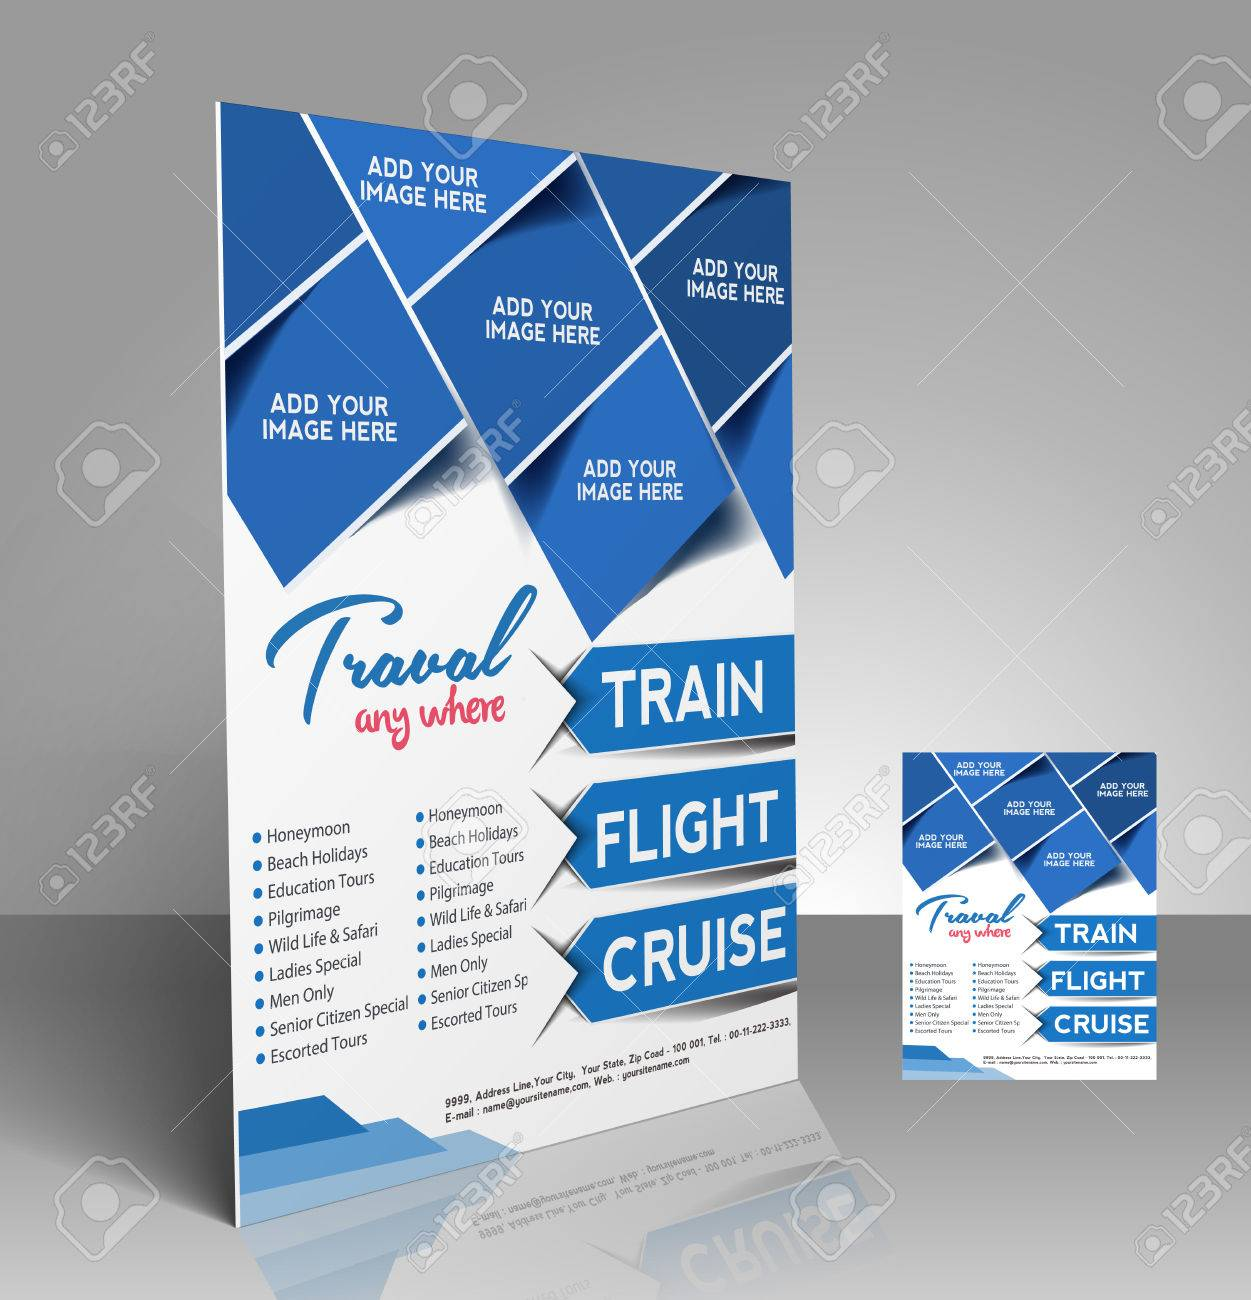 Poster design free template - Travel Center Flyer Poster Template Design Stock Vector 28113915